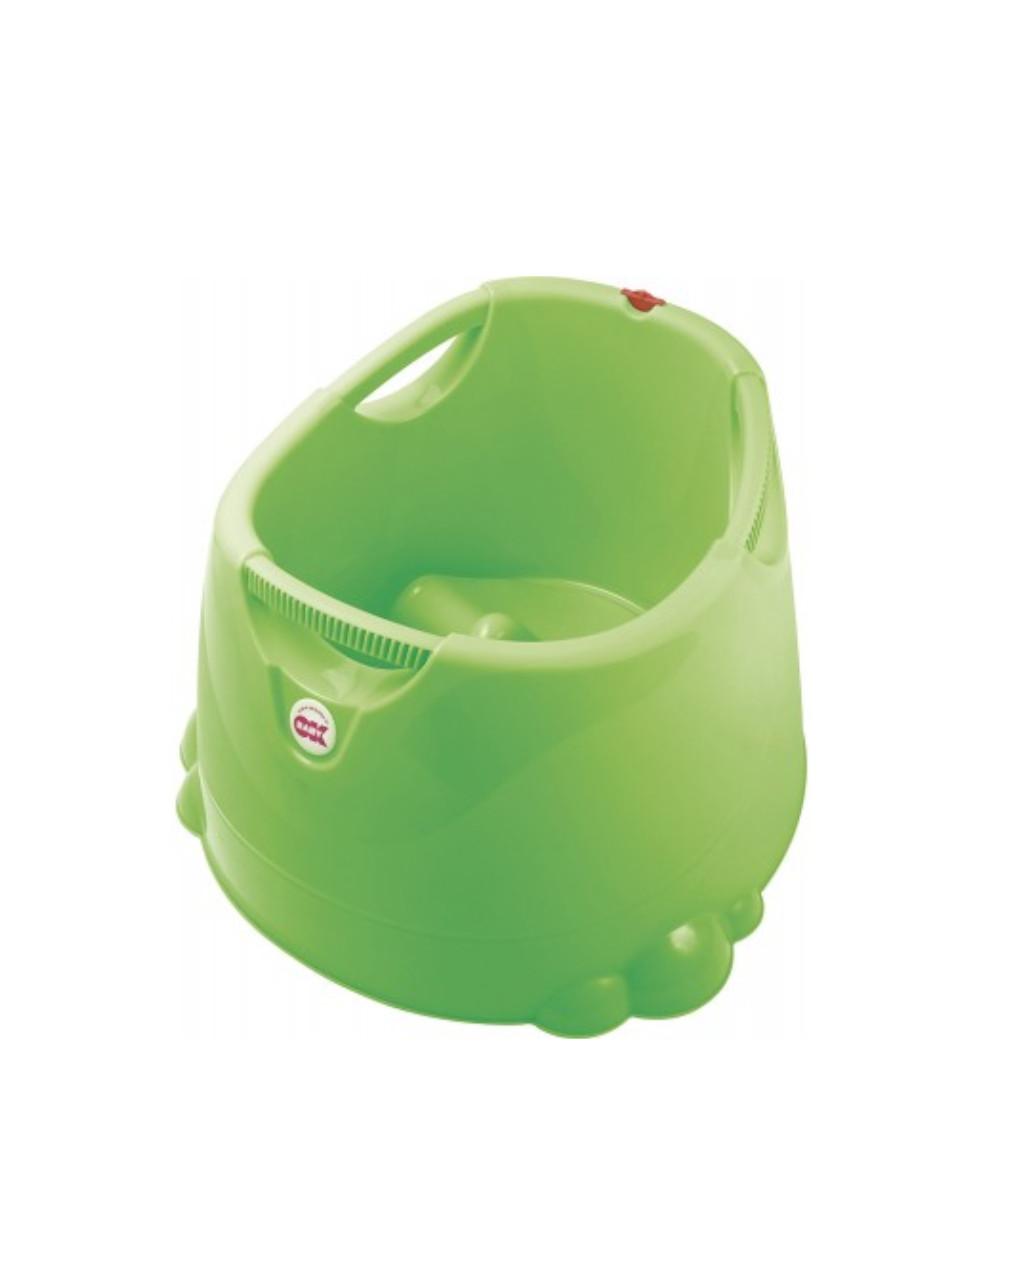 Opla' verde - Okbaby